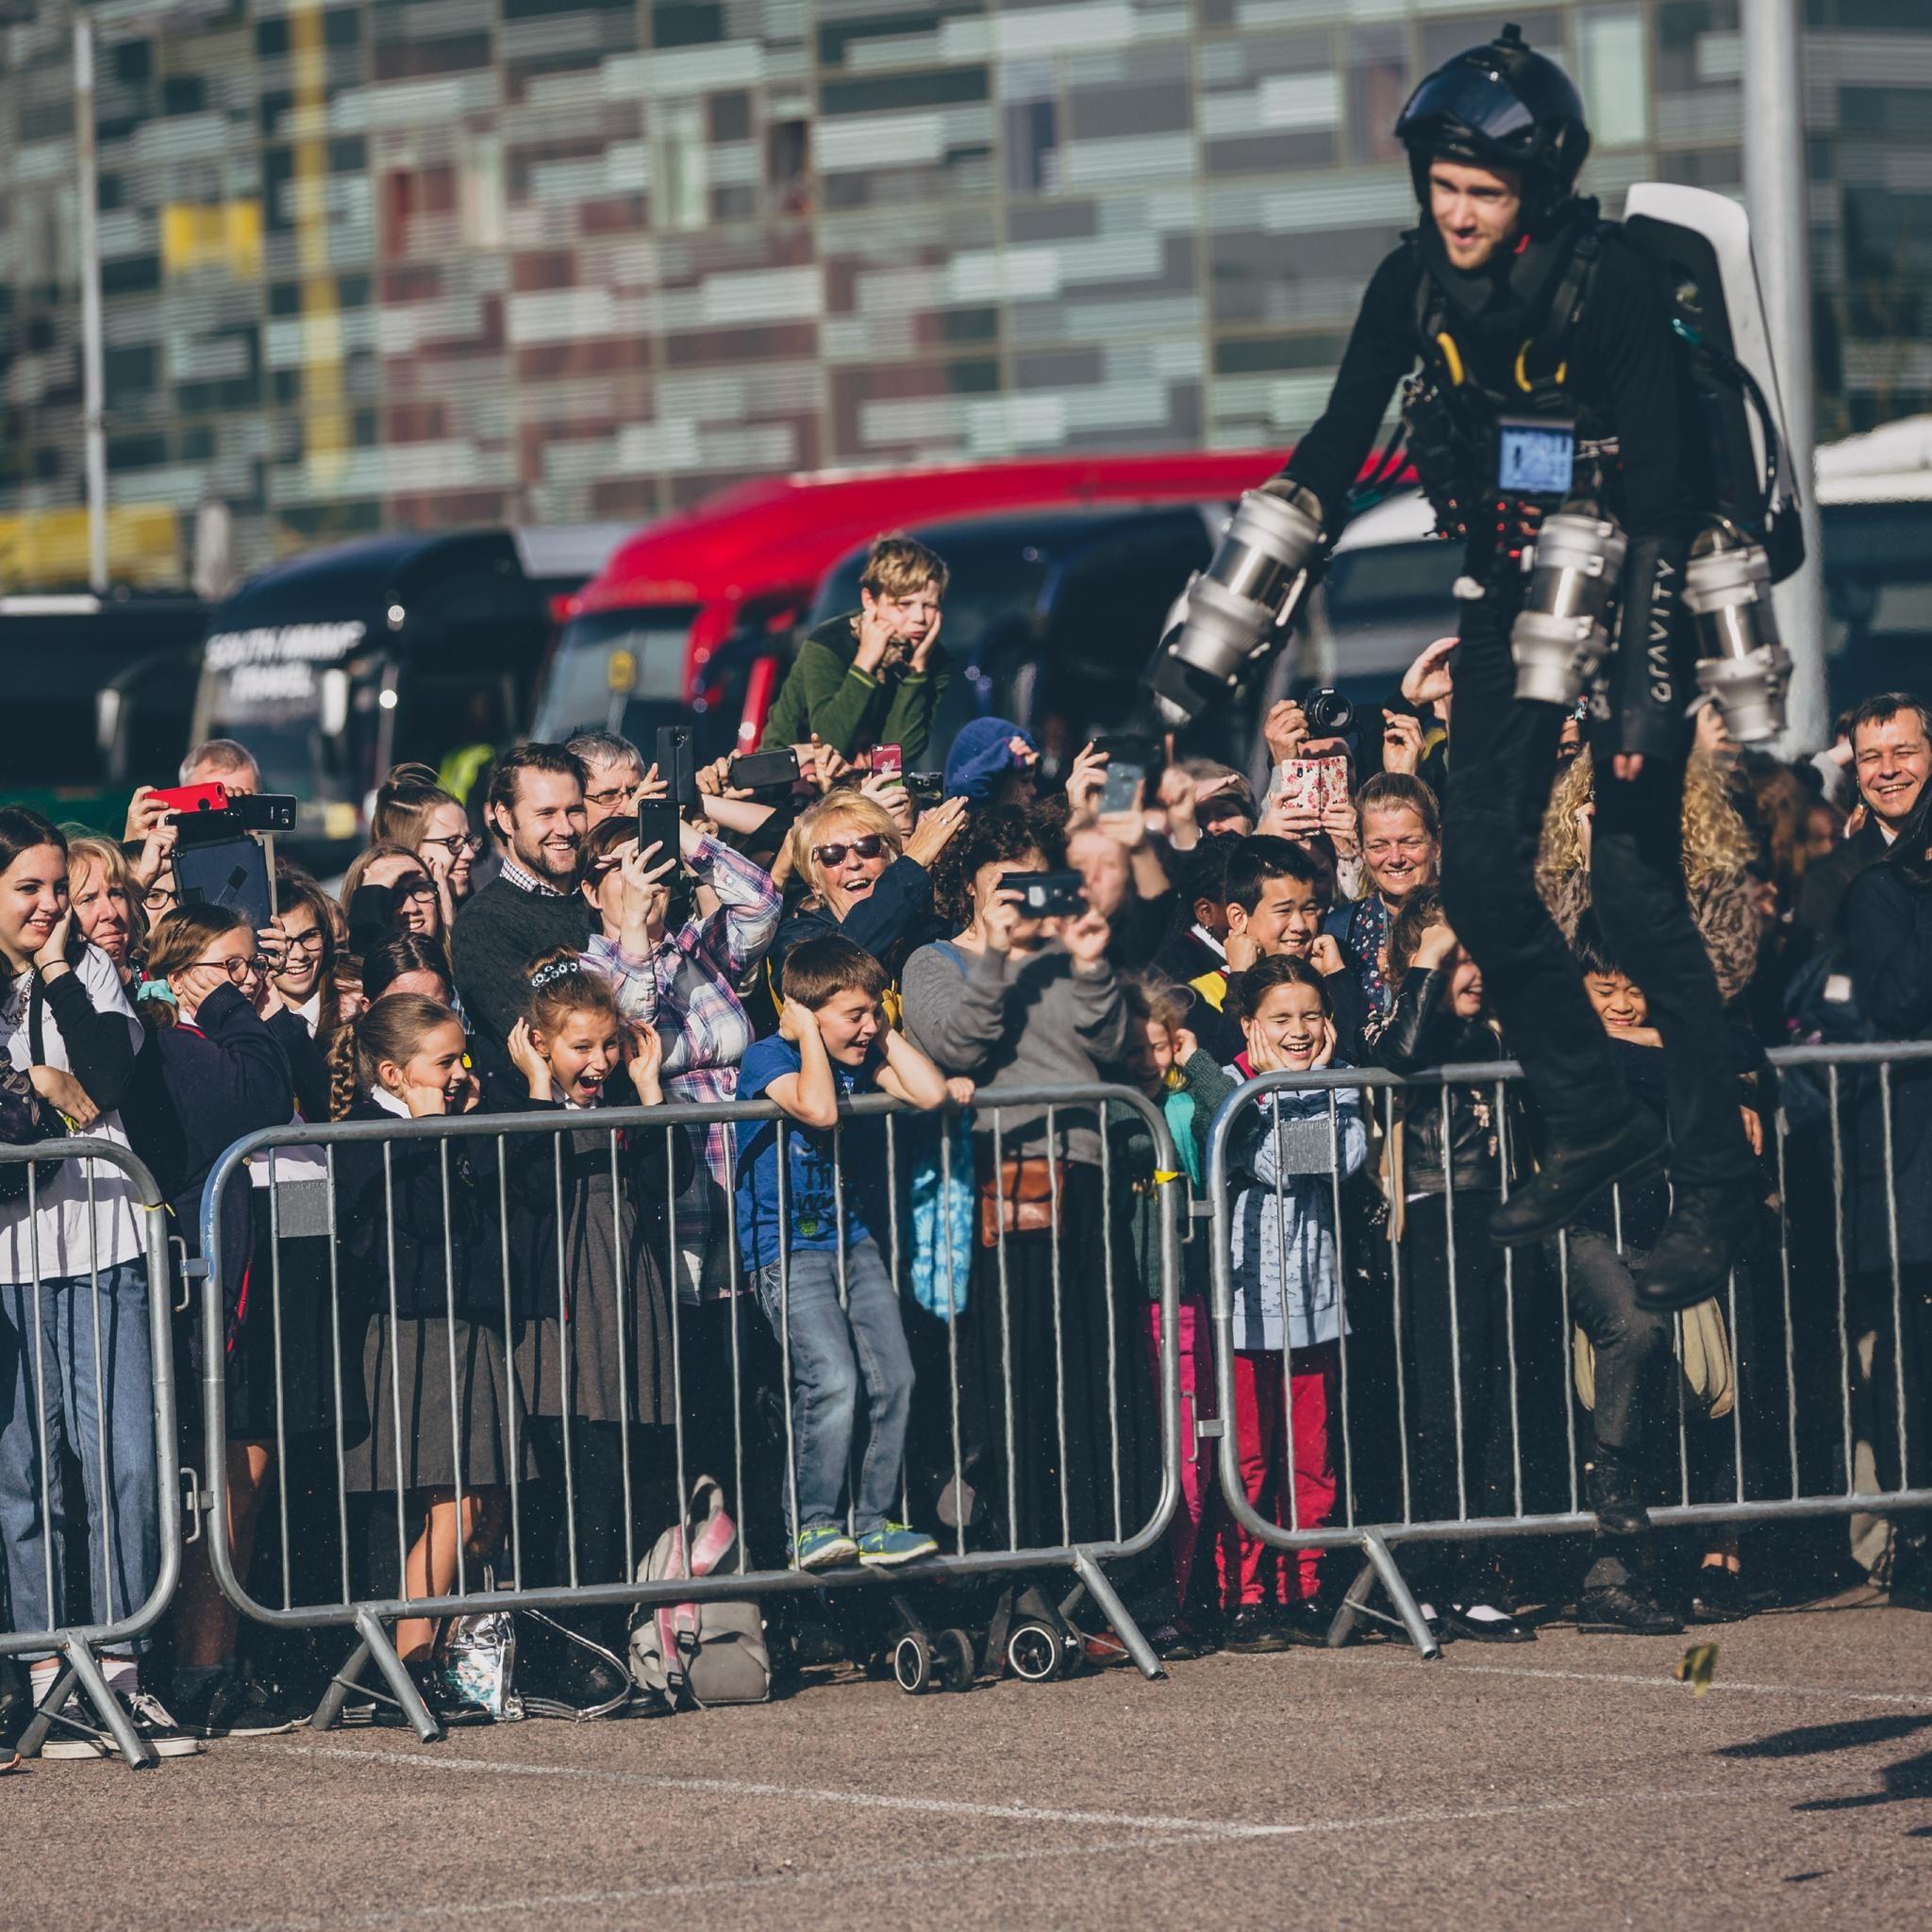 Sam Rogers' Jet Suit Flight Demonstration